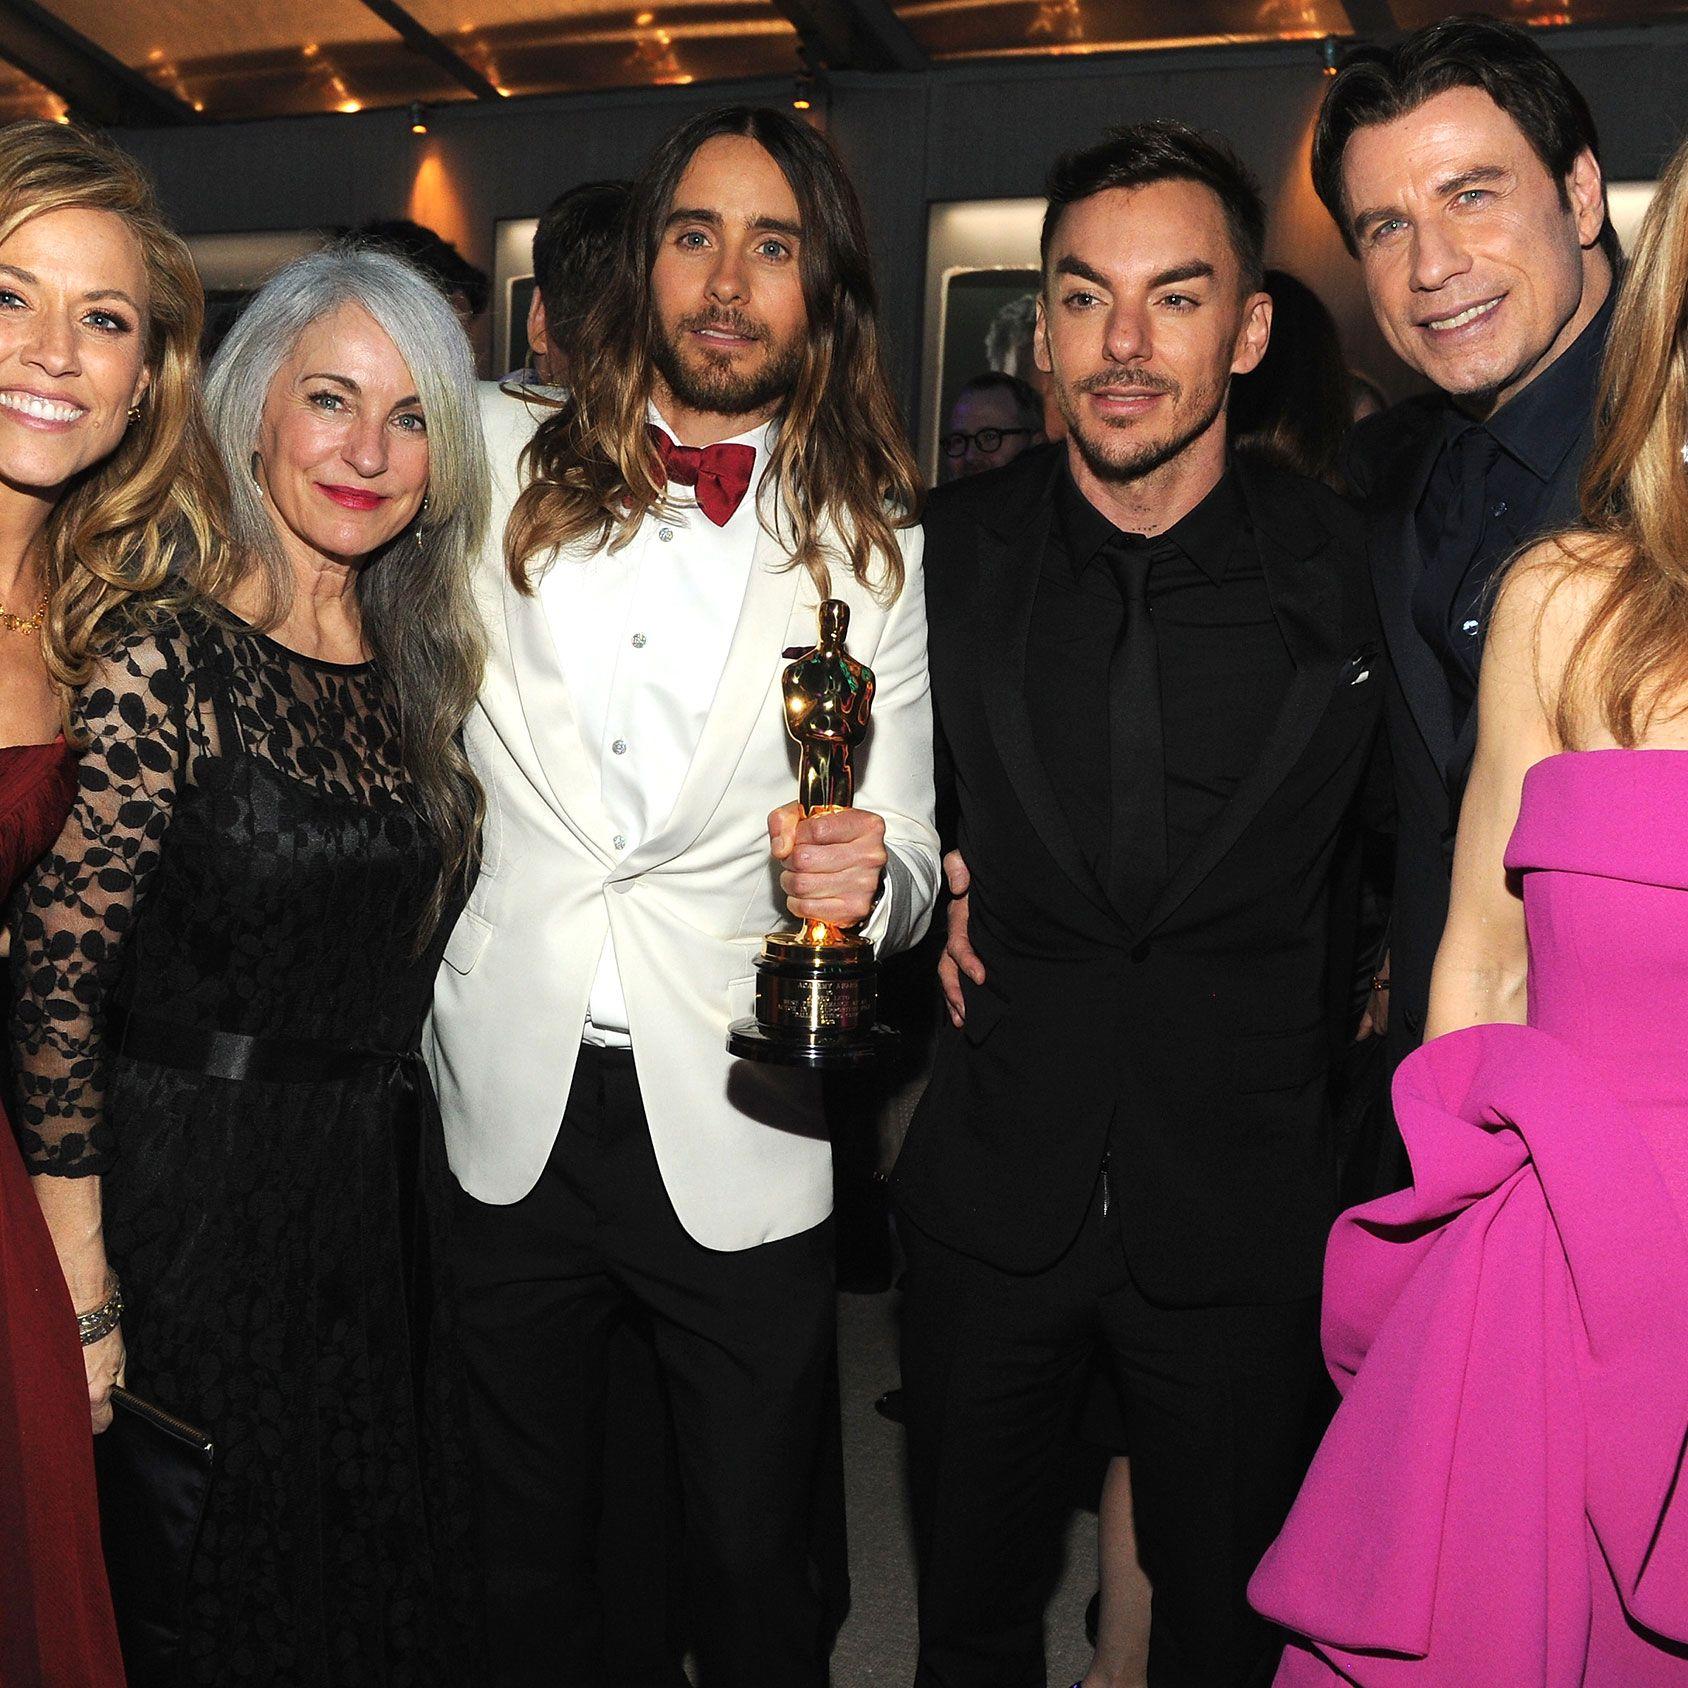 Sheryl Crow, Constance Leto, Jared Leto, John Travolta and Kelly Preston